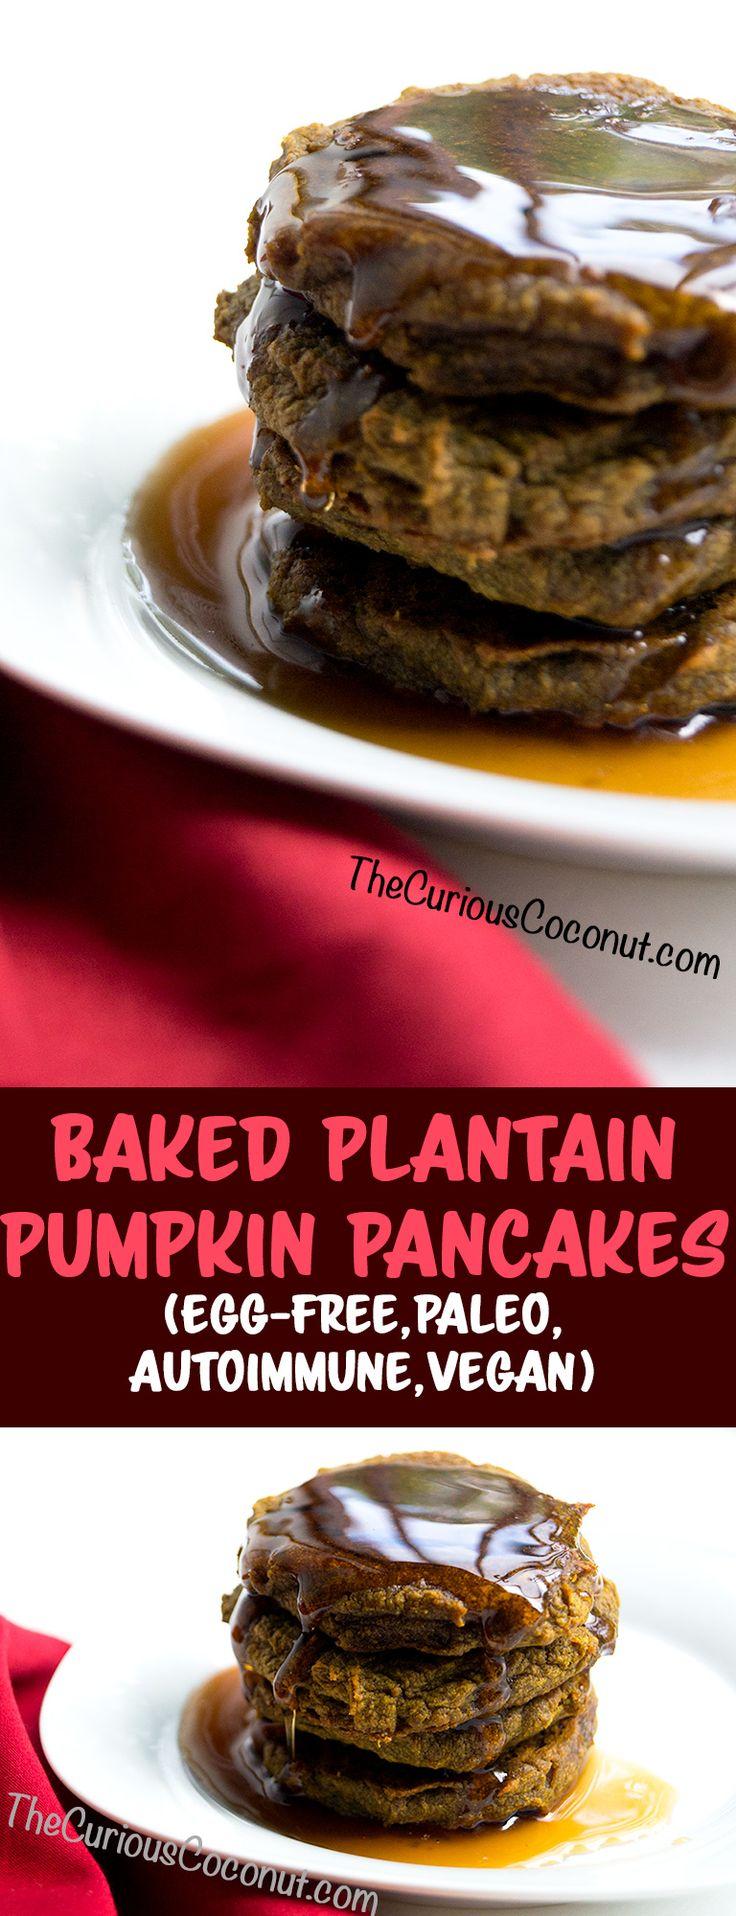 Easy 5-Ingredient Autoimmune Protocol (AIP) Plantain Pumpkin Pancakes (Egg-Free, Paleo, Vegan)  // TheCuriousCoconut.com